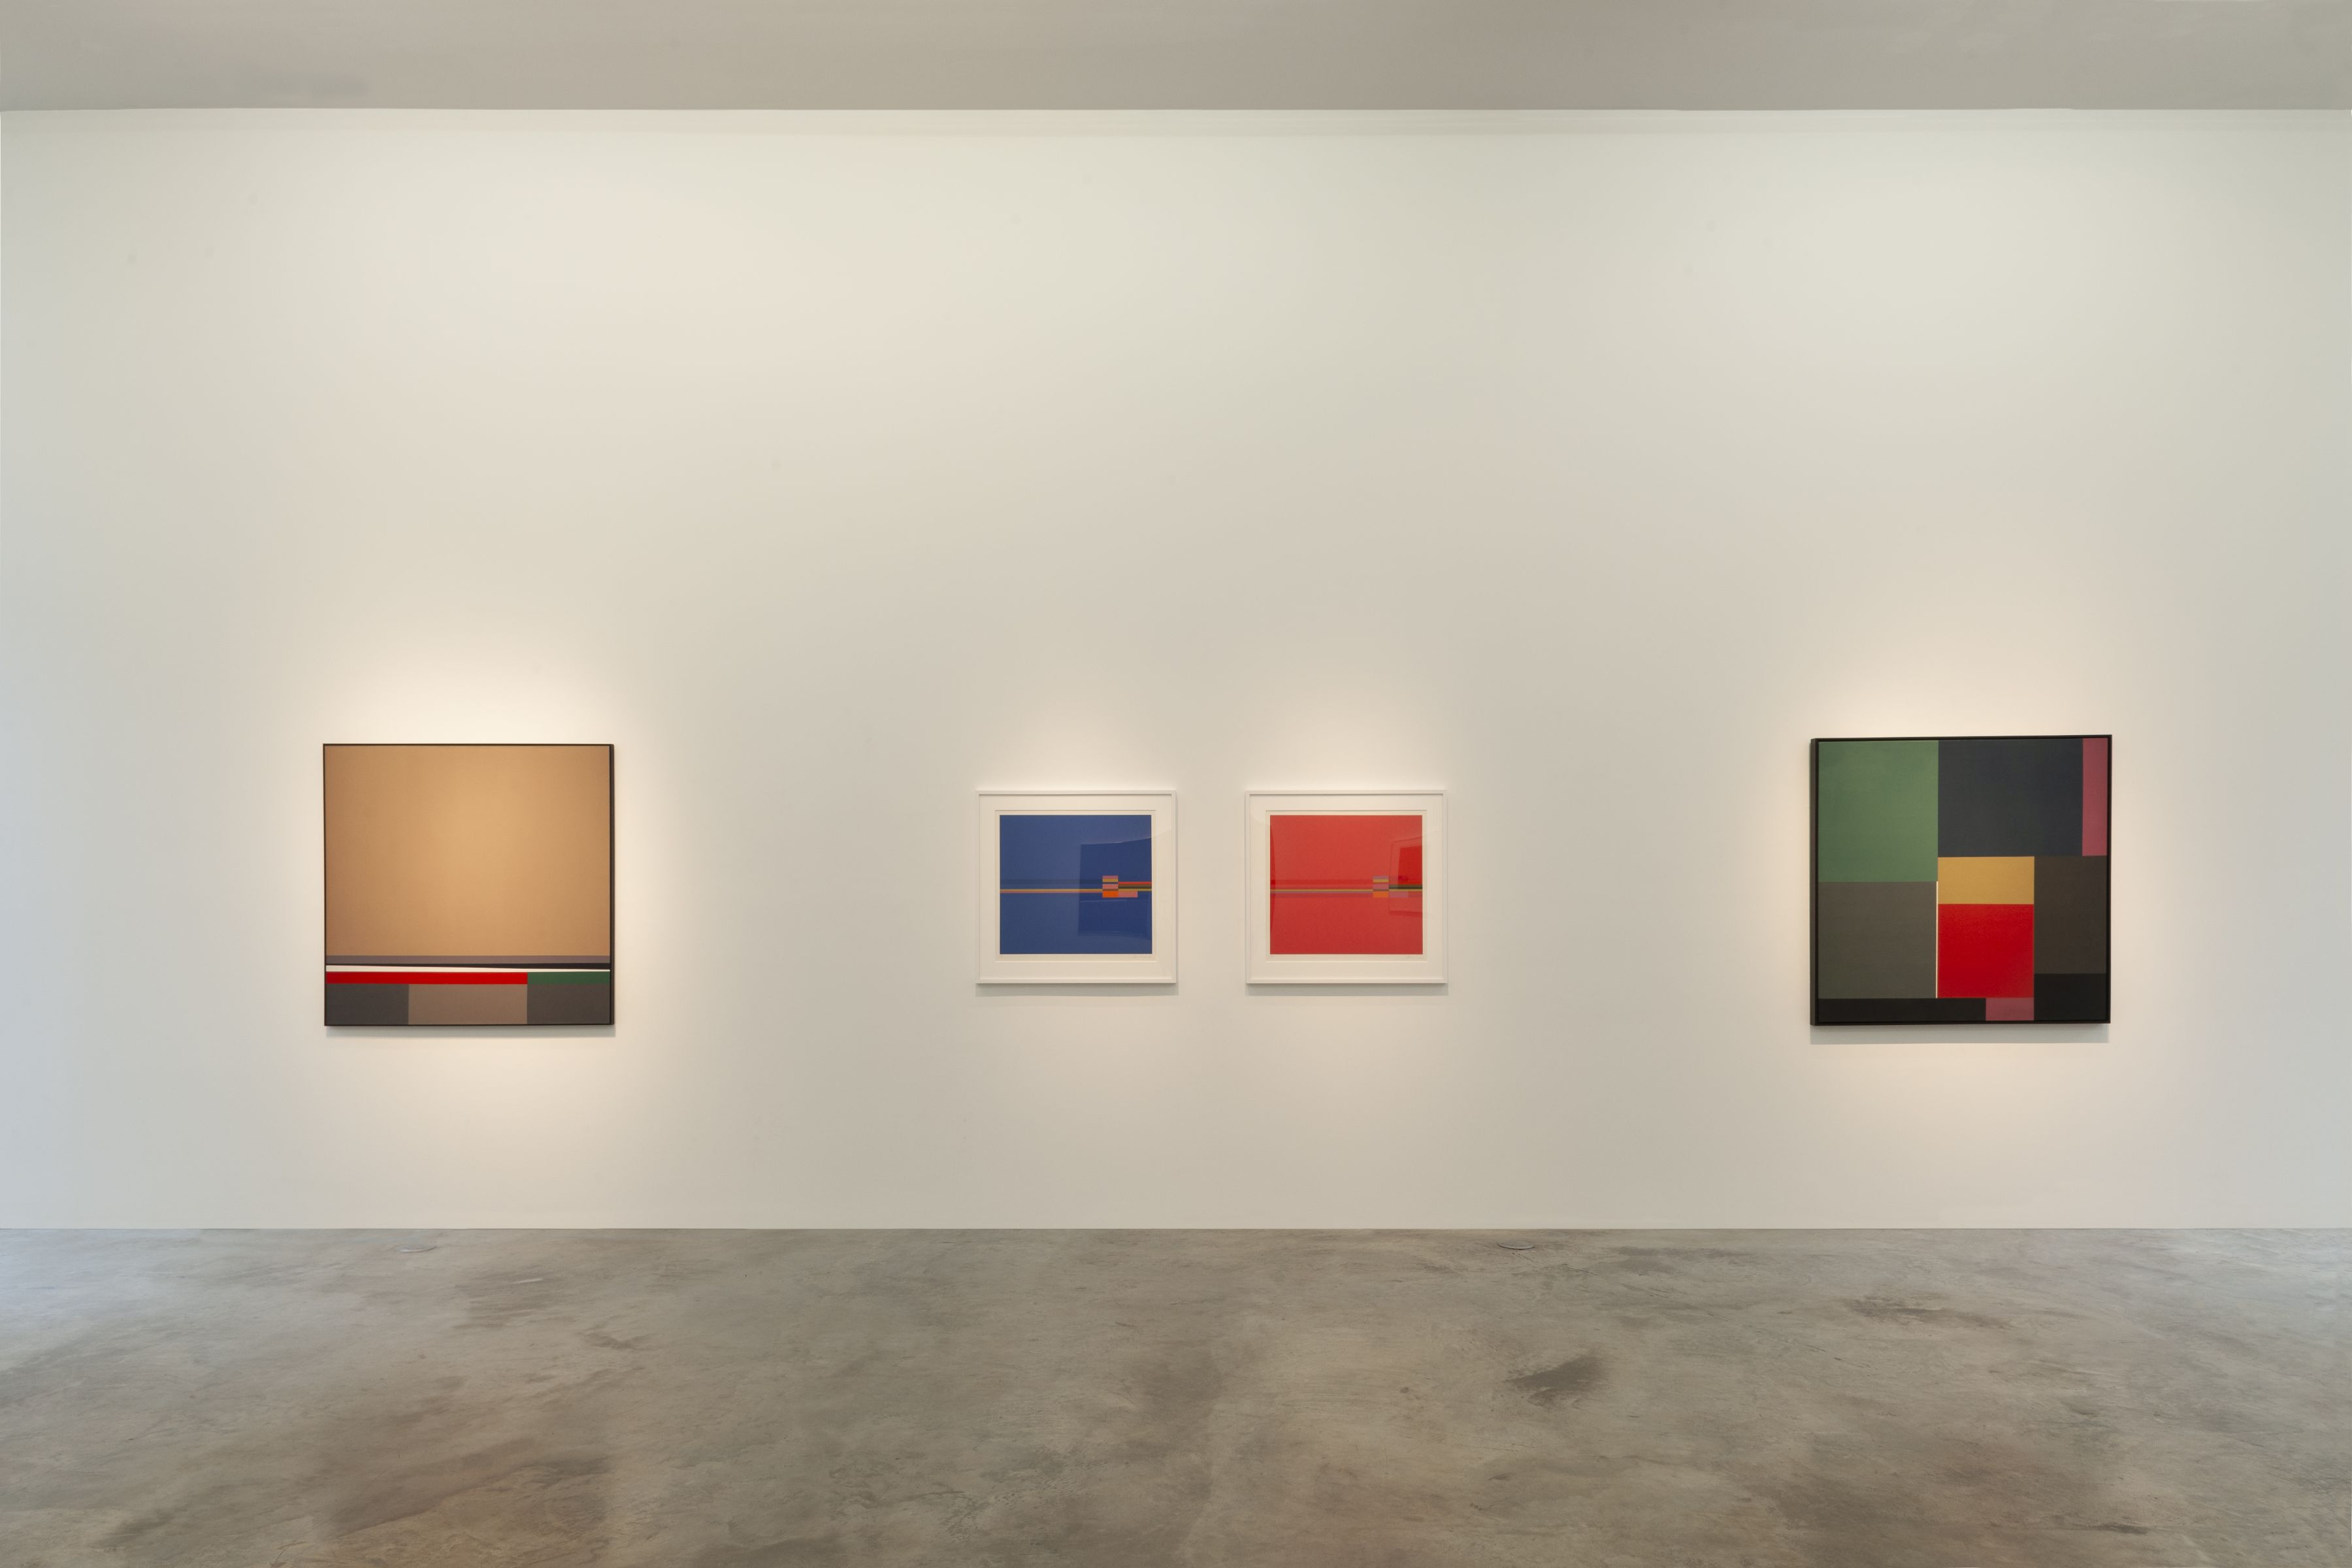 Mercedes Pardo,Beyond Color. Sicardi | Ayers | Bacino, 2018